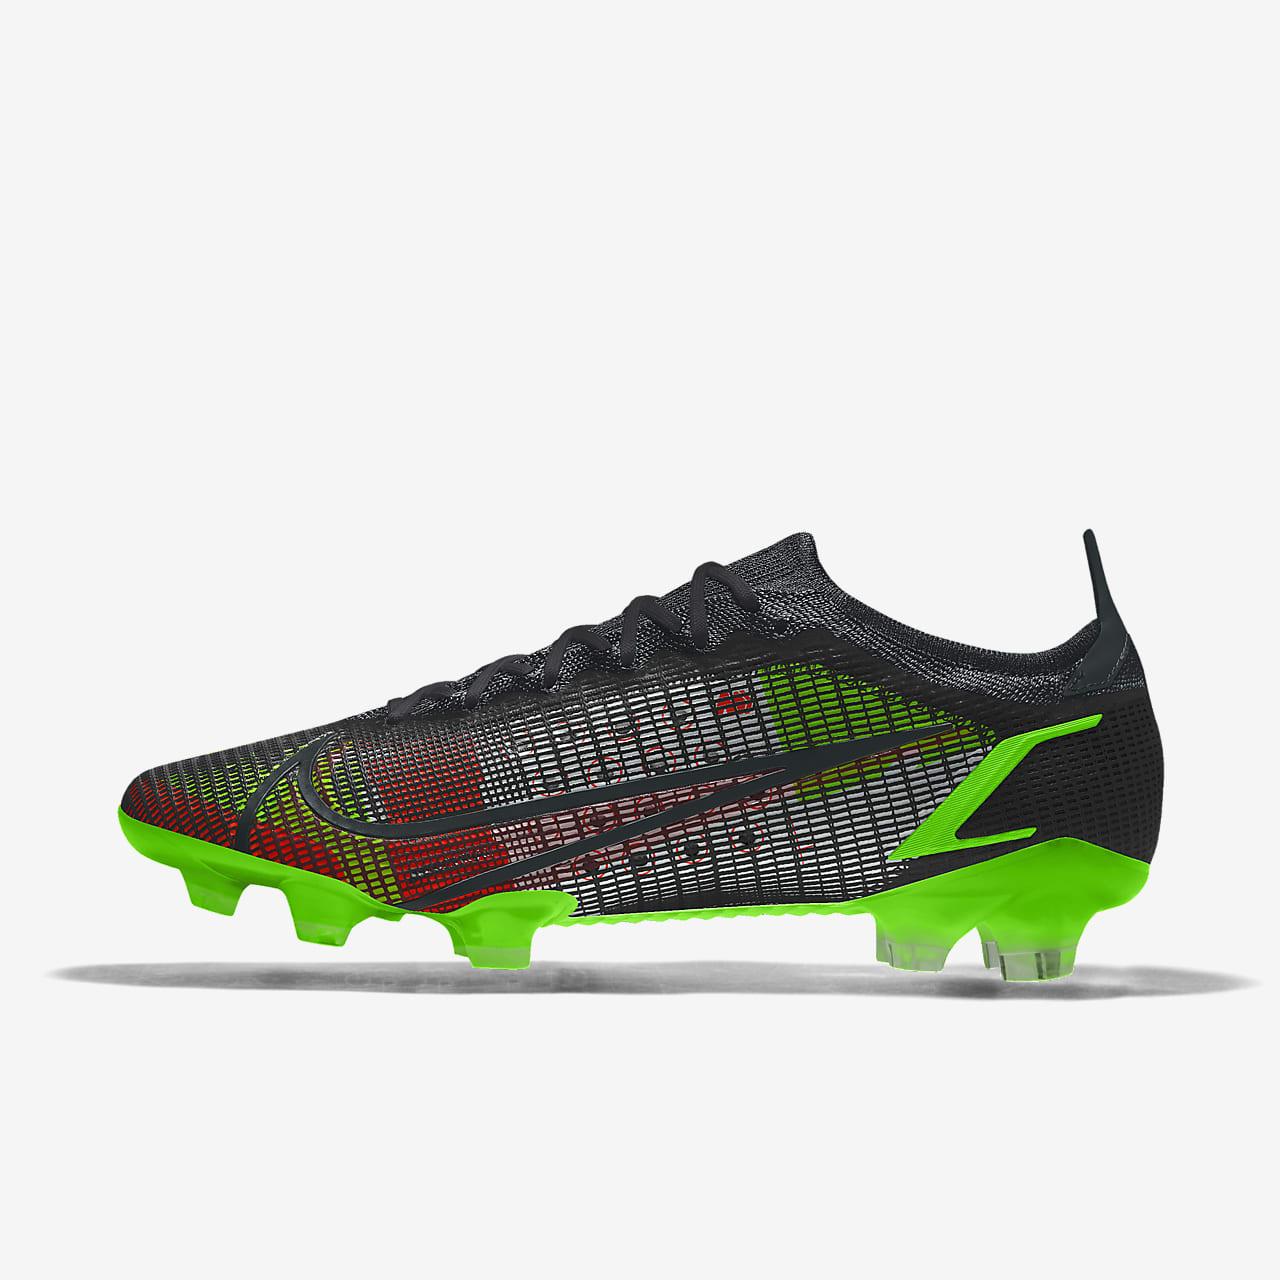 Nike Mercurial Vapor 14 Elite By You personalisierbarer Fußballschuh